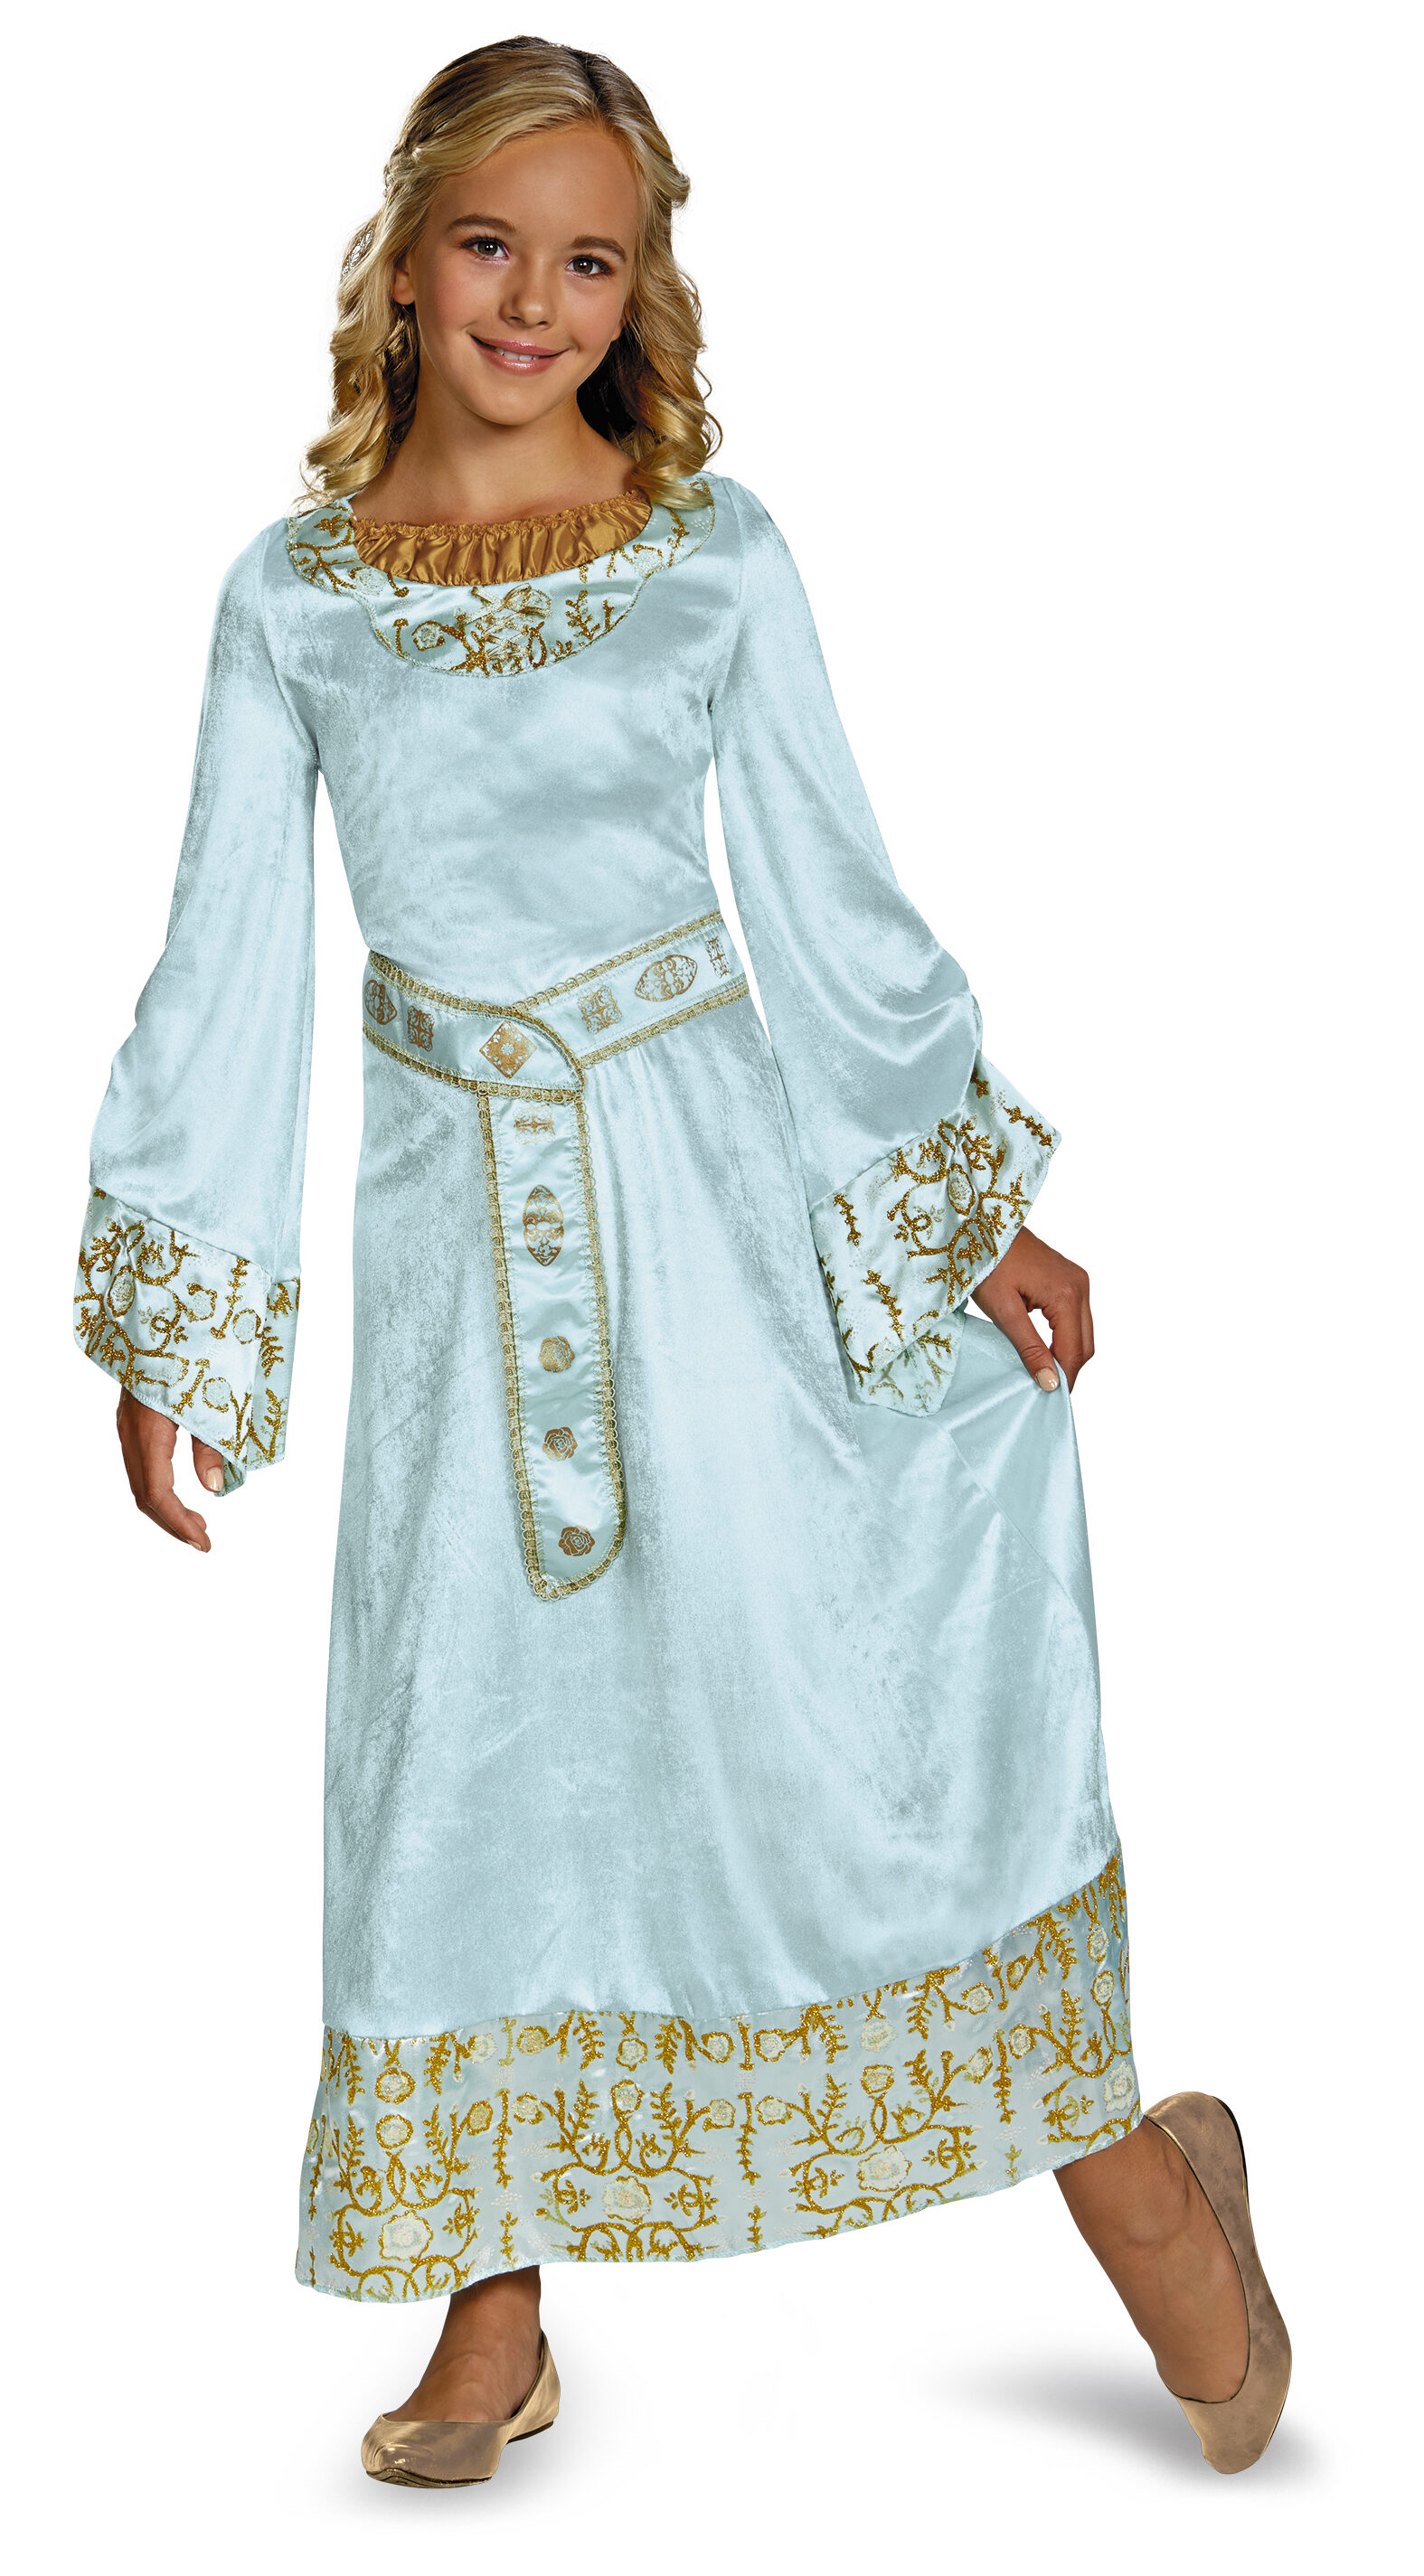 disney princess aurora kids costume mr costumes. Black Bedroom Furniture Sets. Home Design Ideas